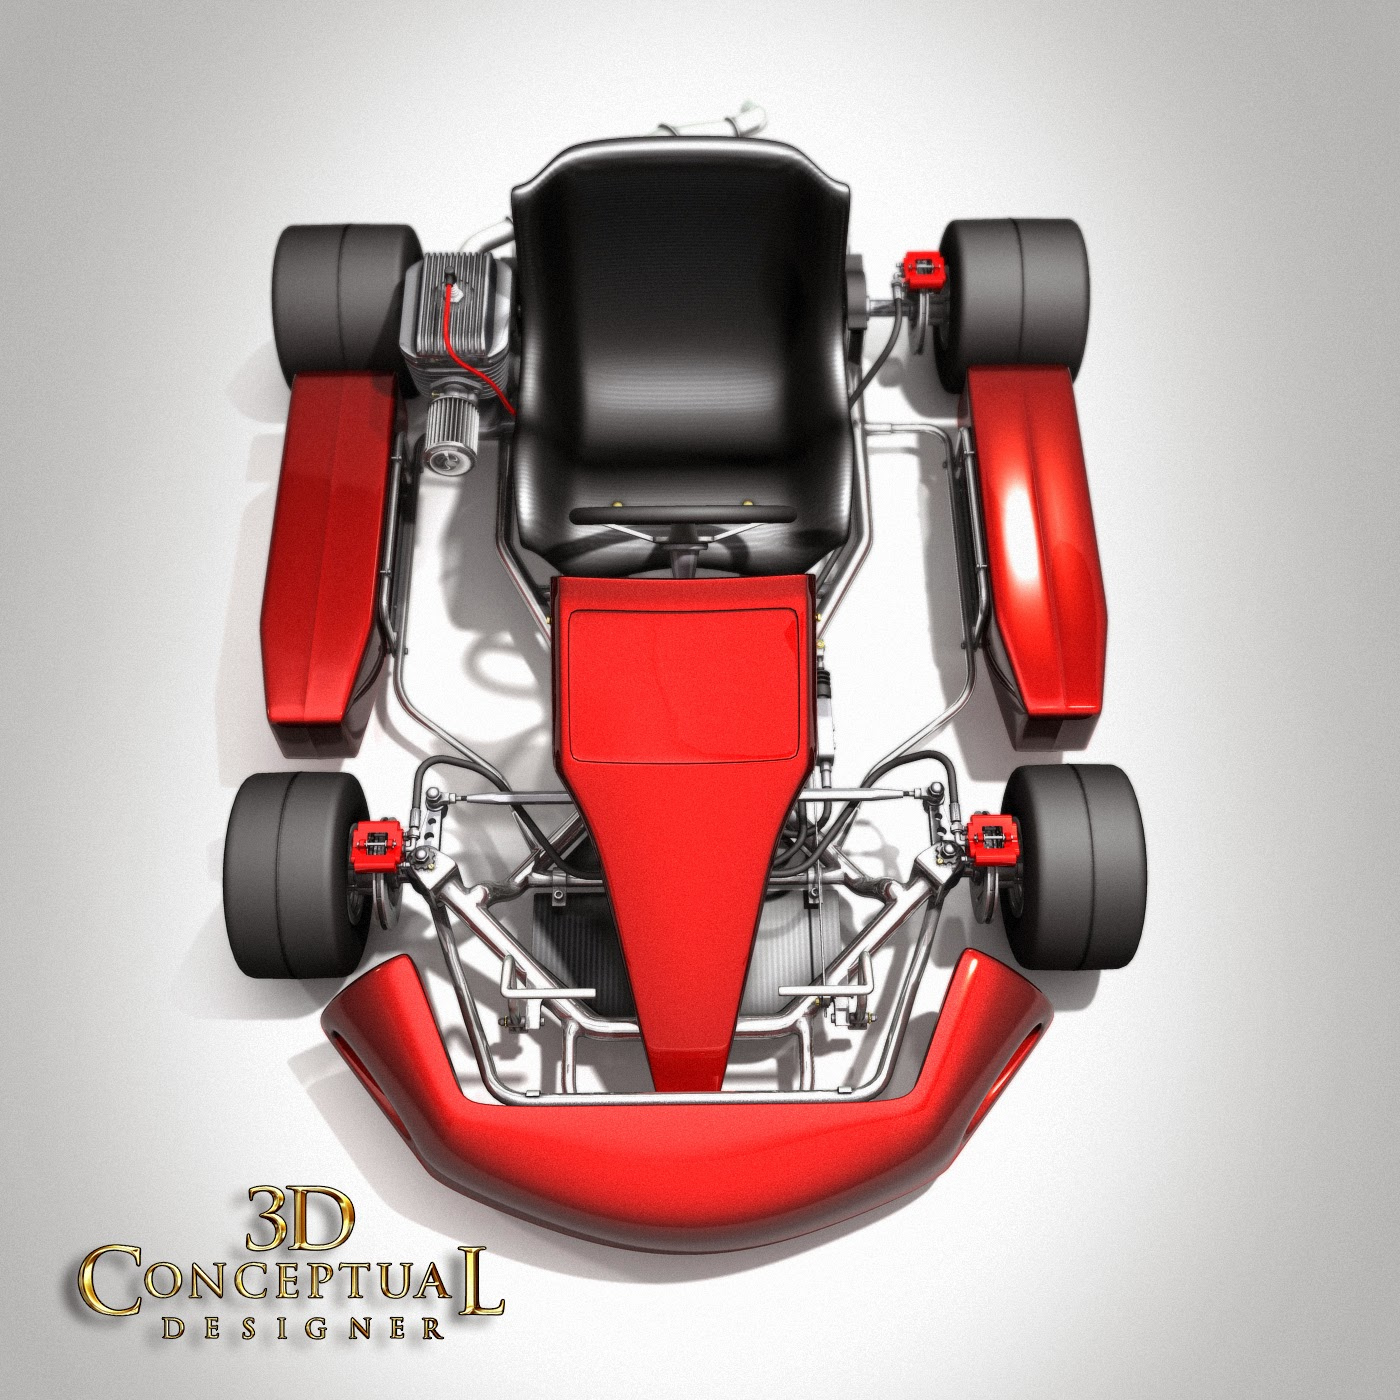 3DconceptualdesignerBlog: 3D Stock Model Build Review: Shifter Kart